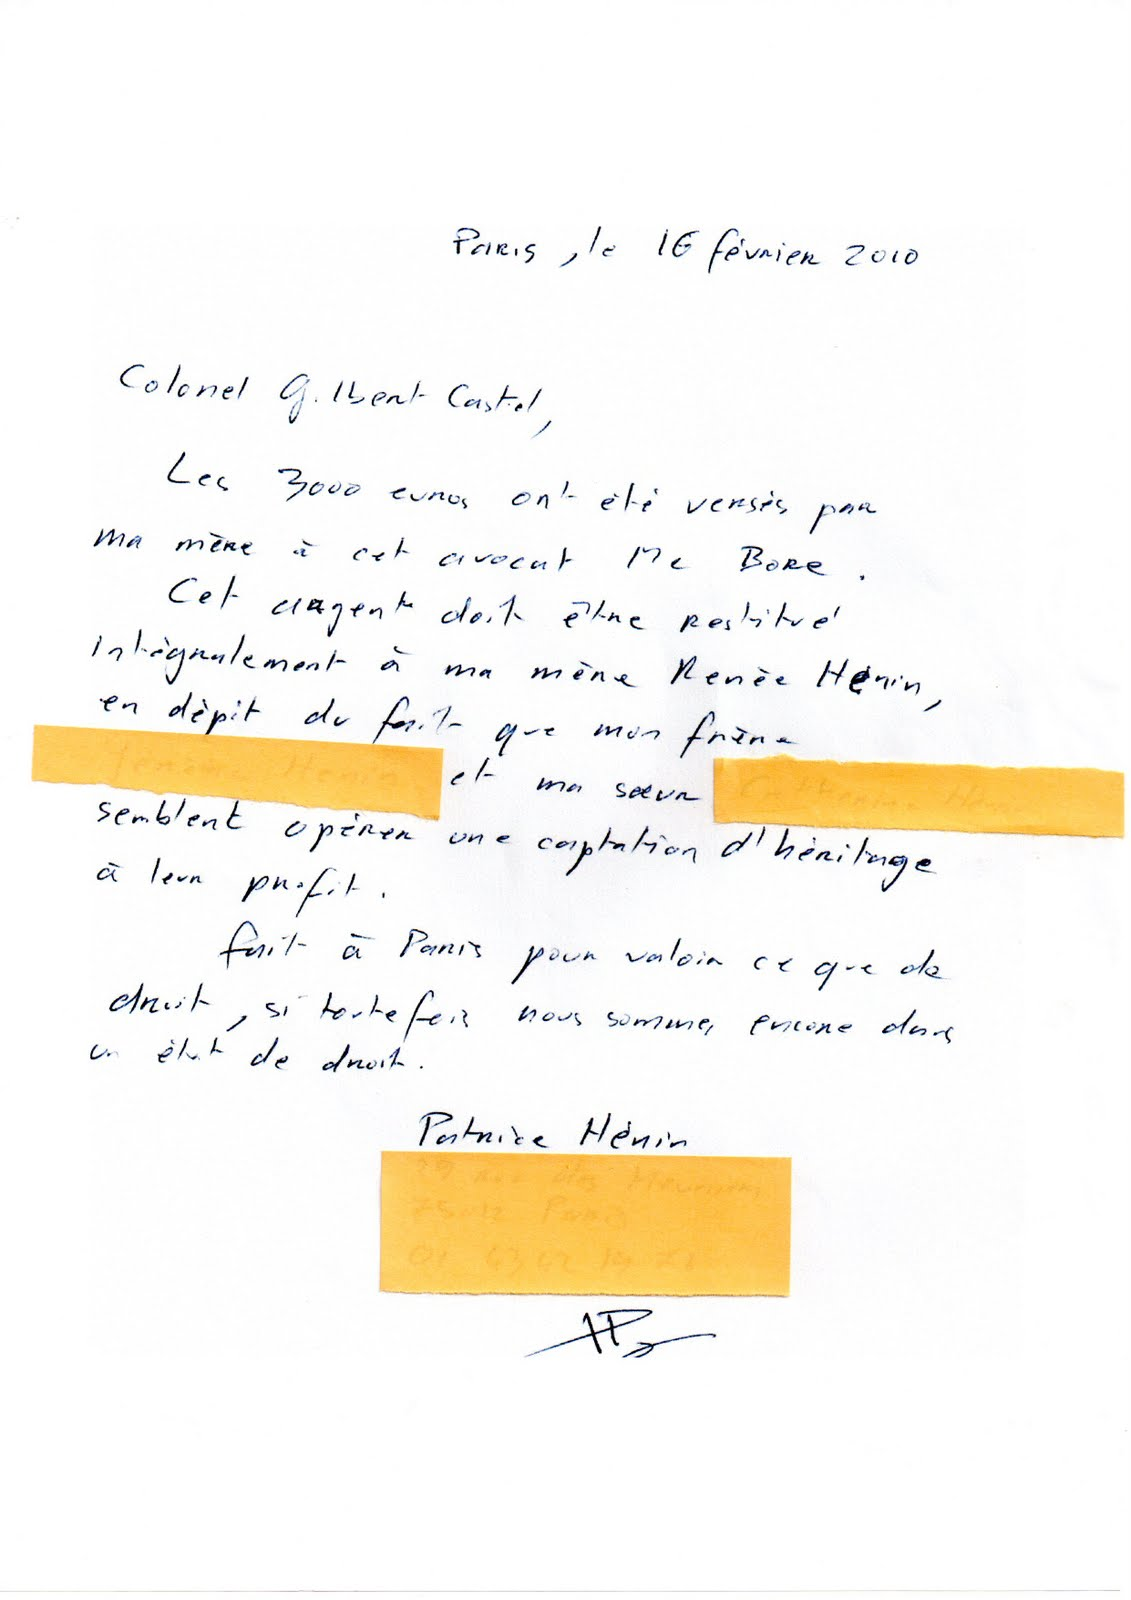 modele lettre de porte fort Patrice Hénin modele lettre de porte fort